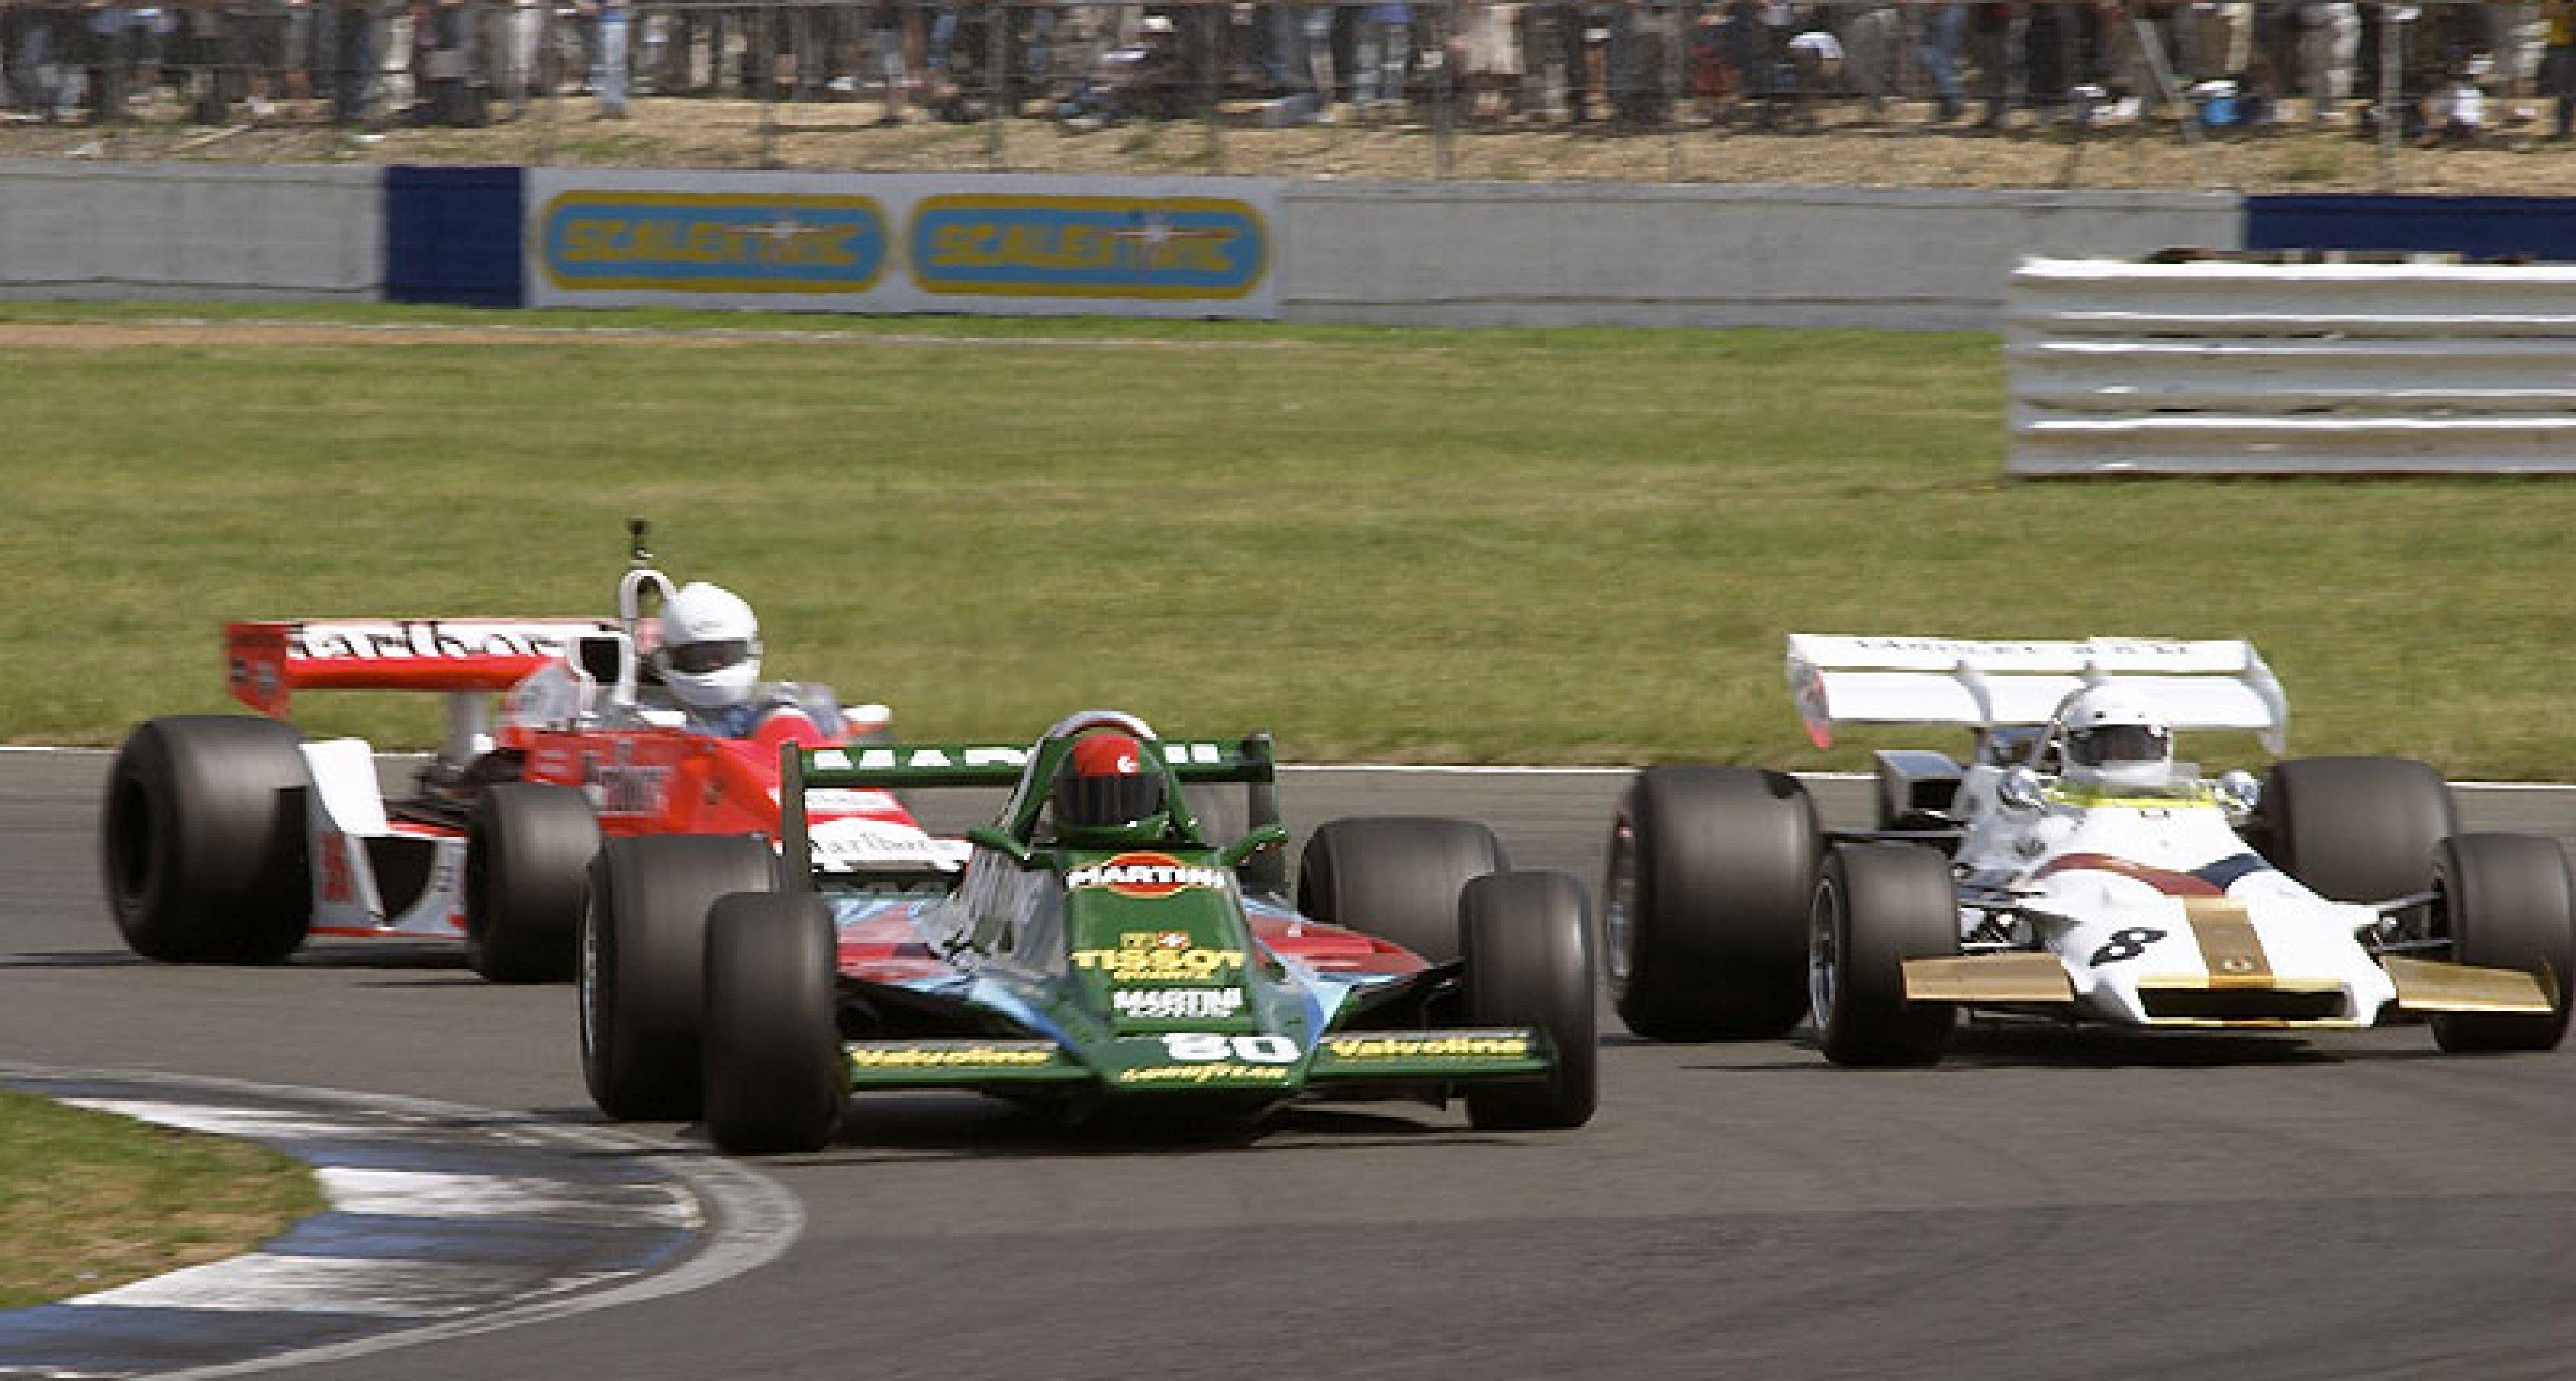 The Silverstone Classic 2006